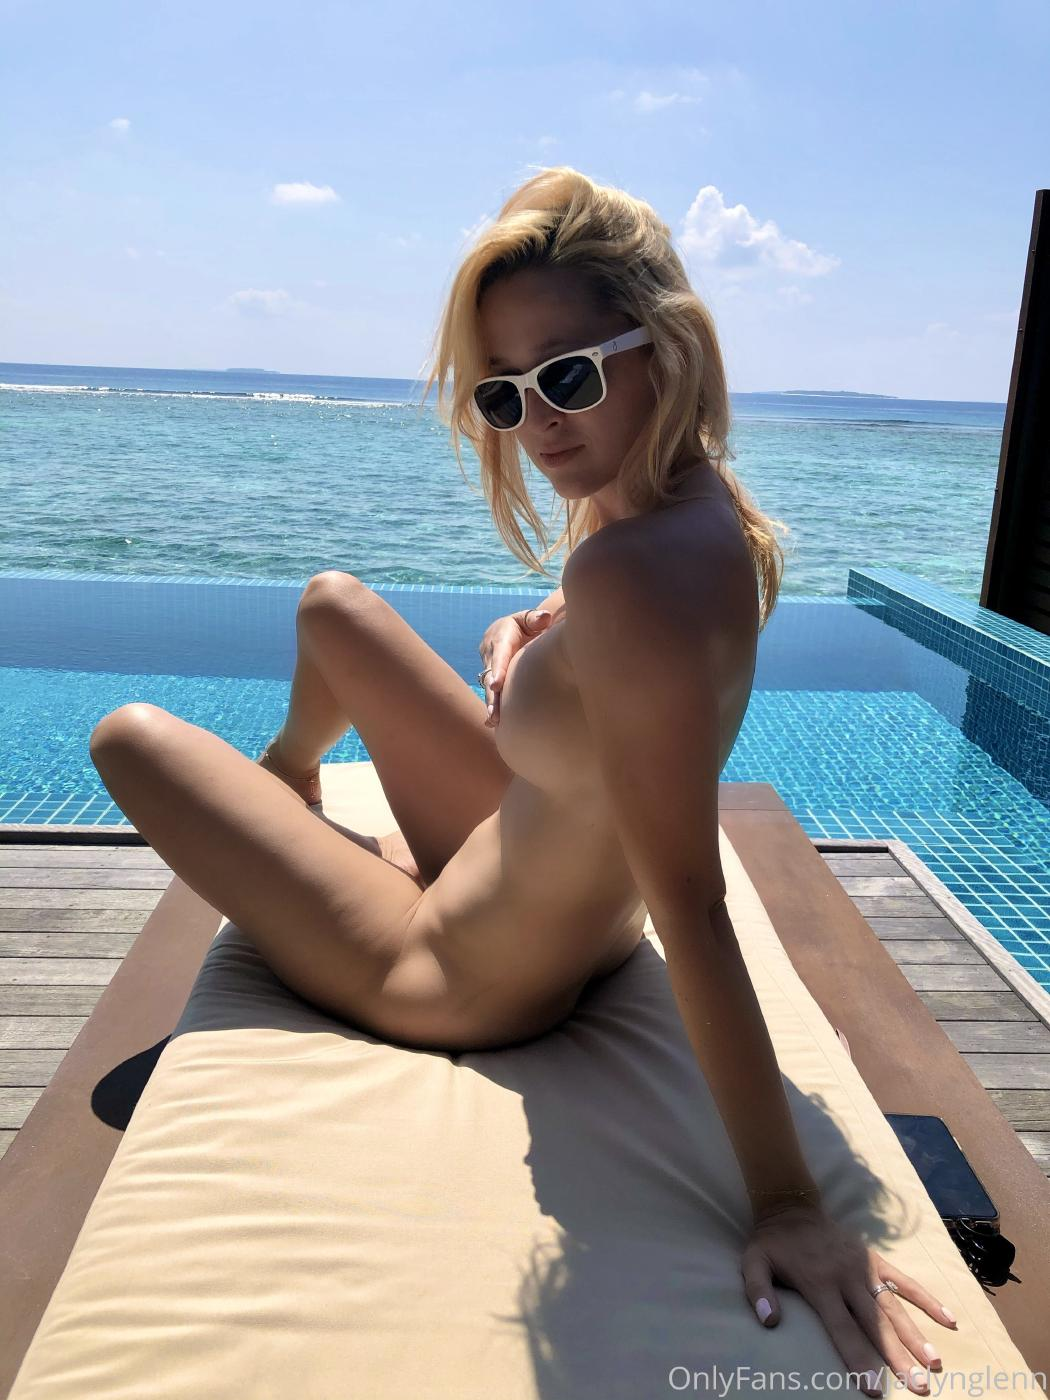 Jaclyn Glenn Nude Bikini Onlyfans Set Leaked Zfqrfh